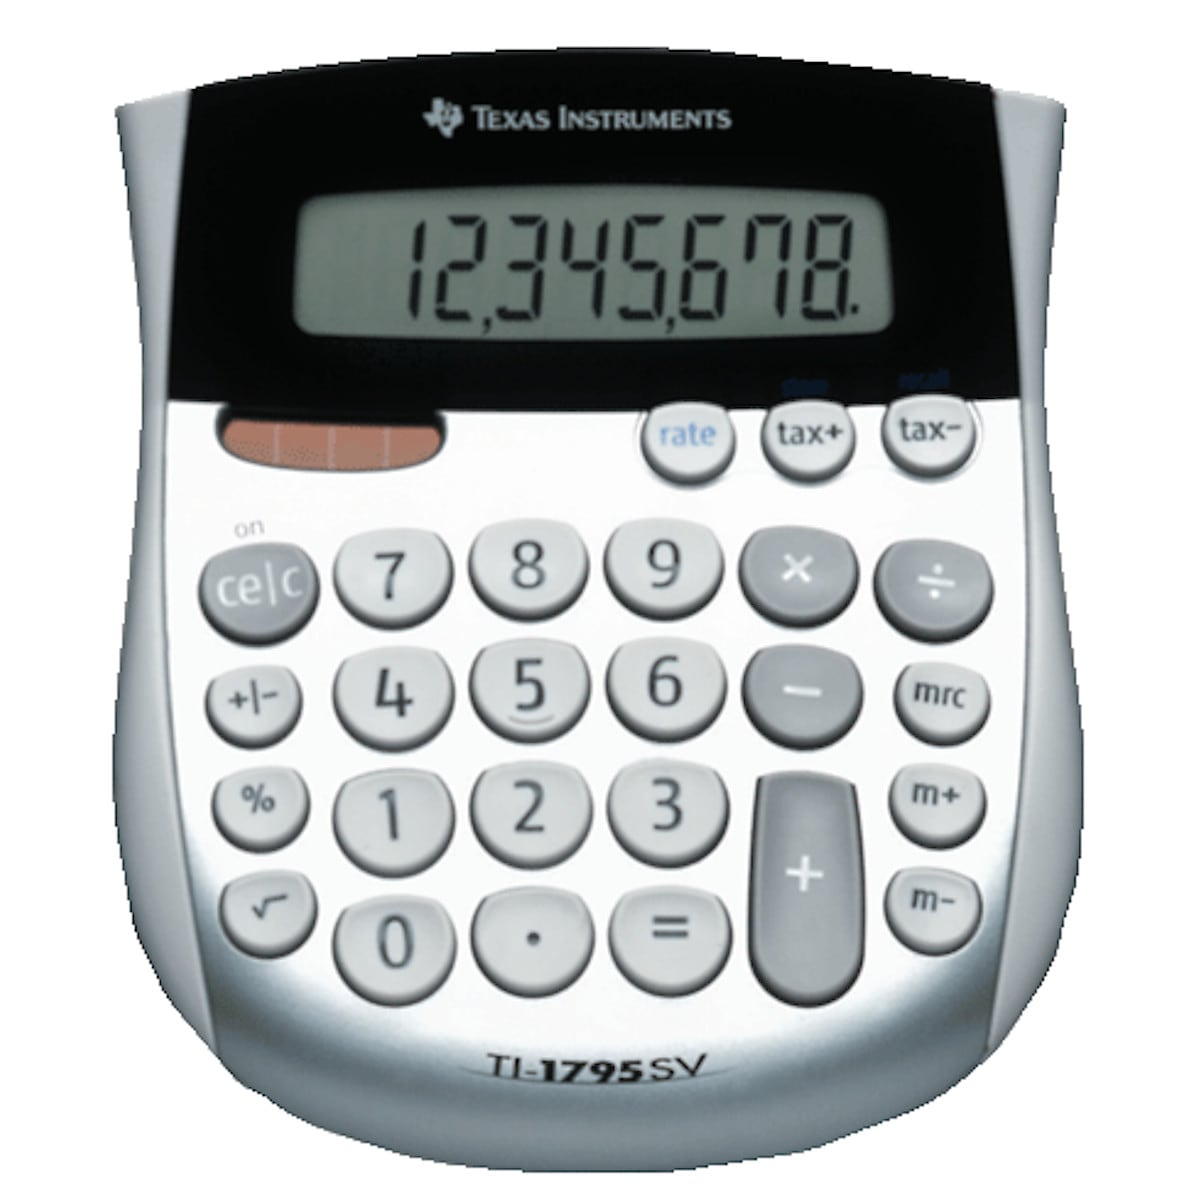 Texas TI-1795SV Calculator